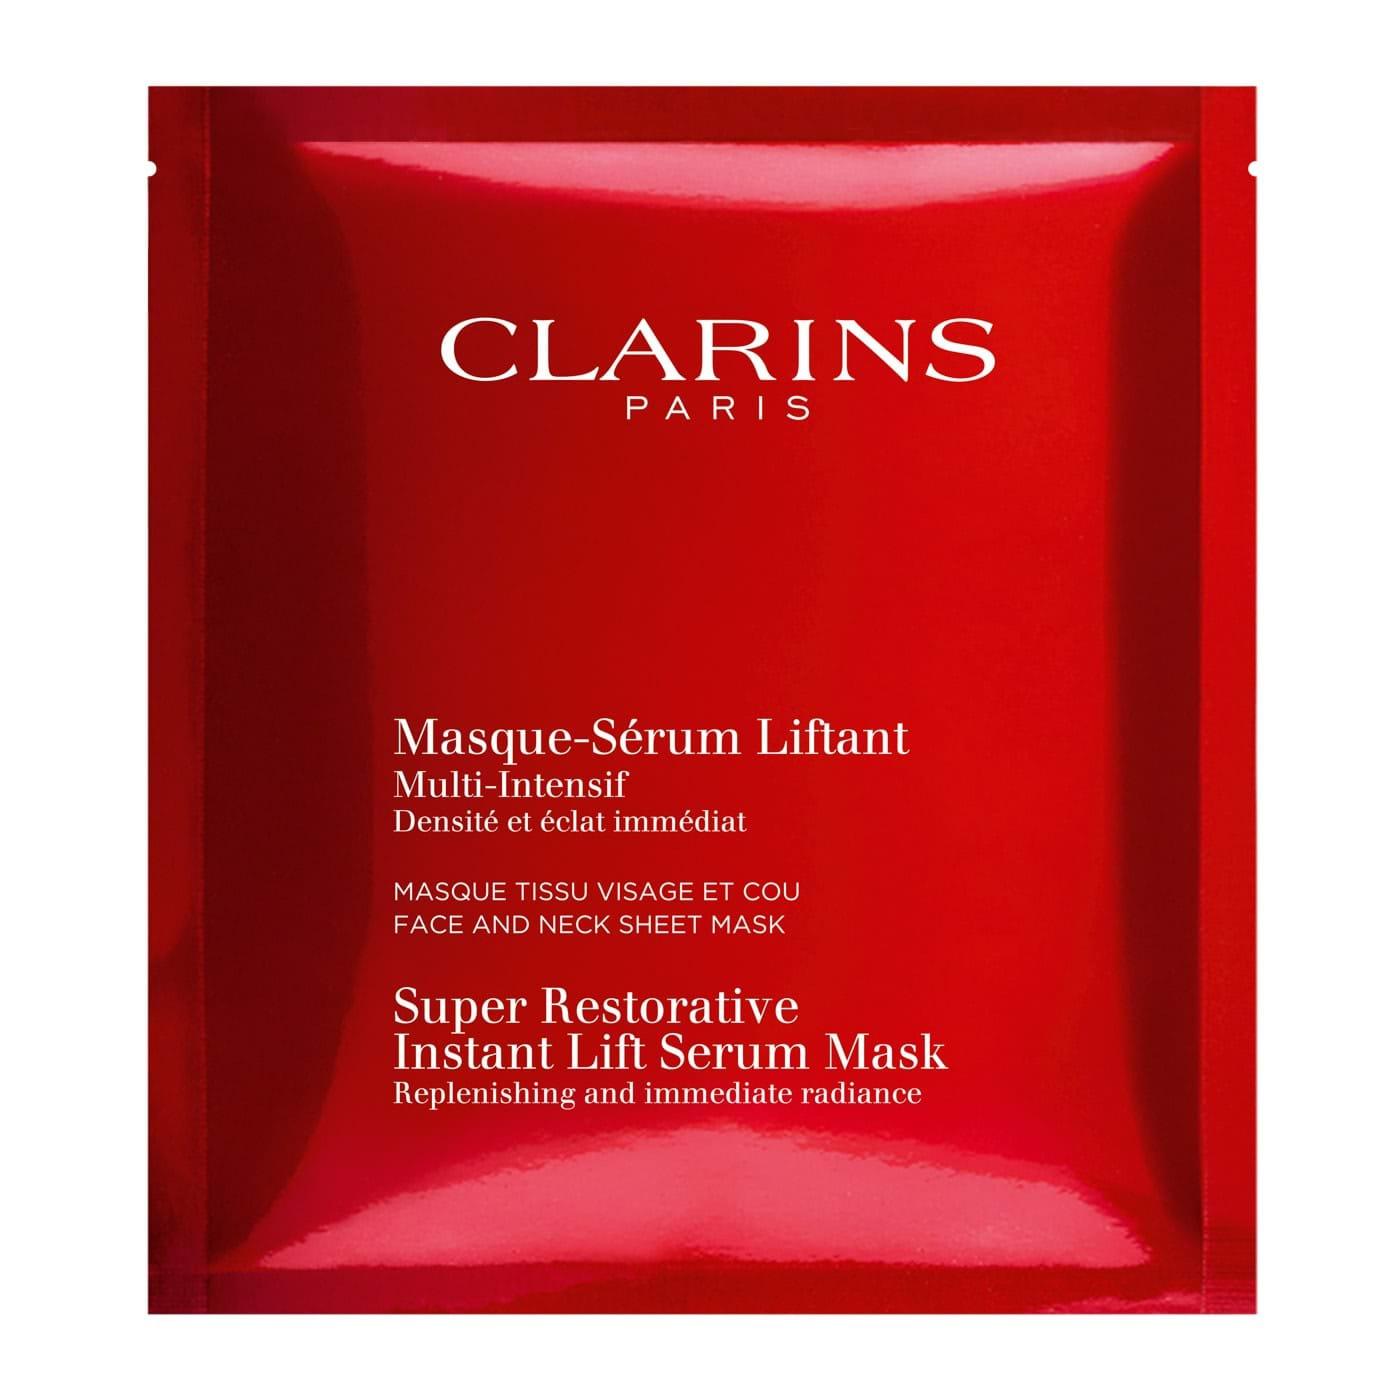 Super Restorative Instant Lift Serum Mask by Clarins #17